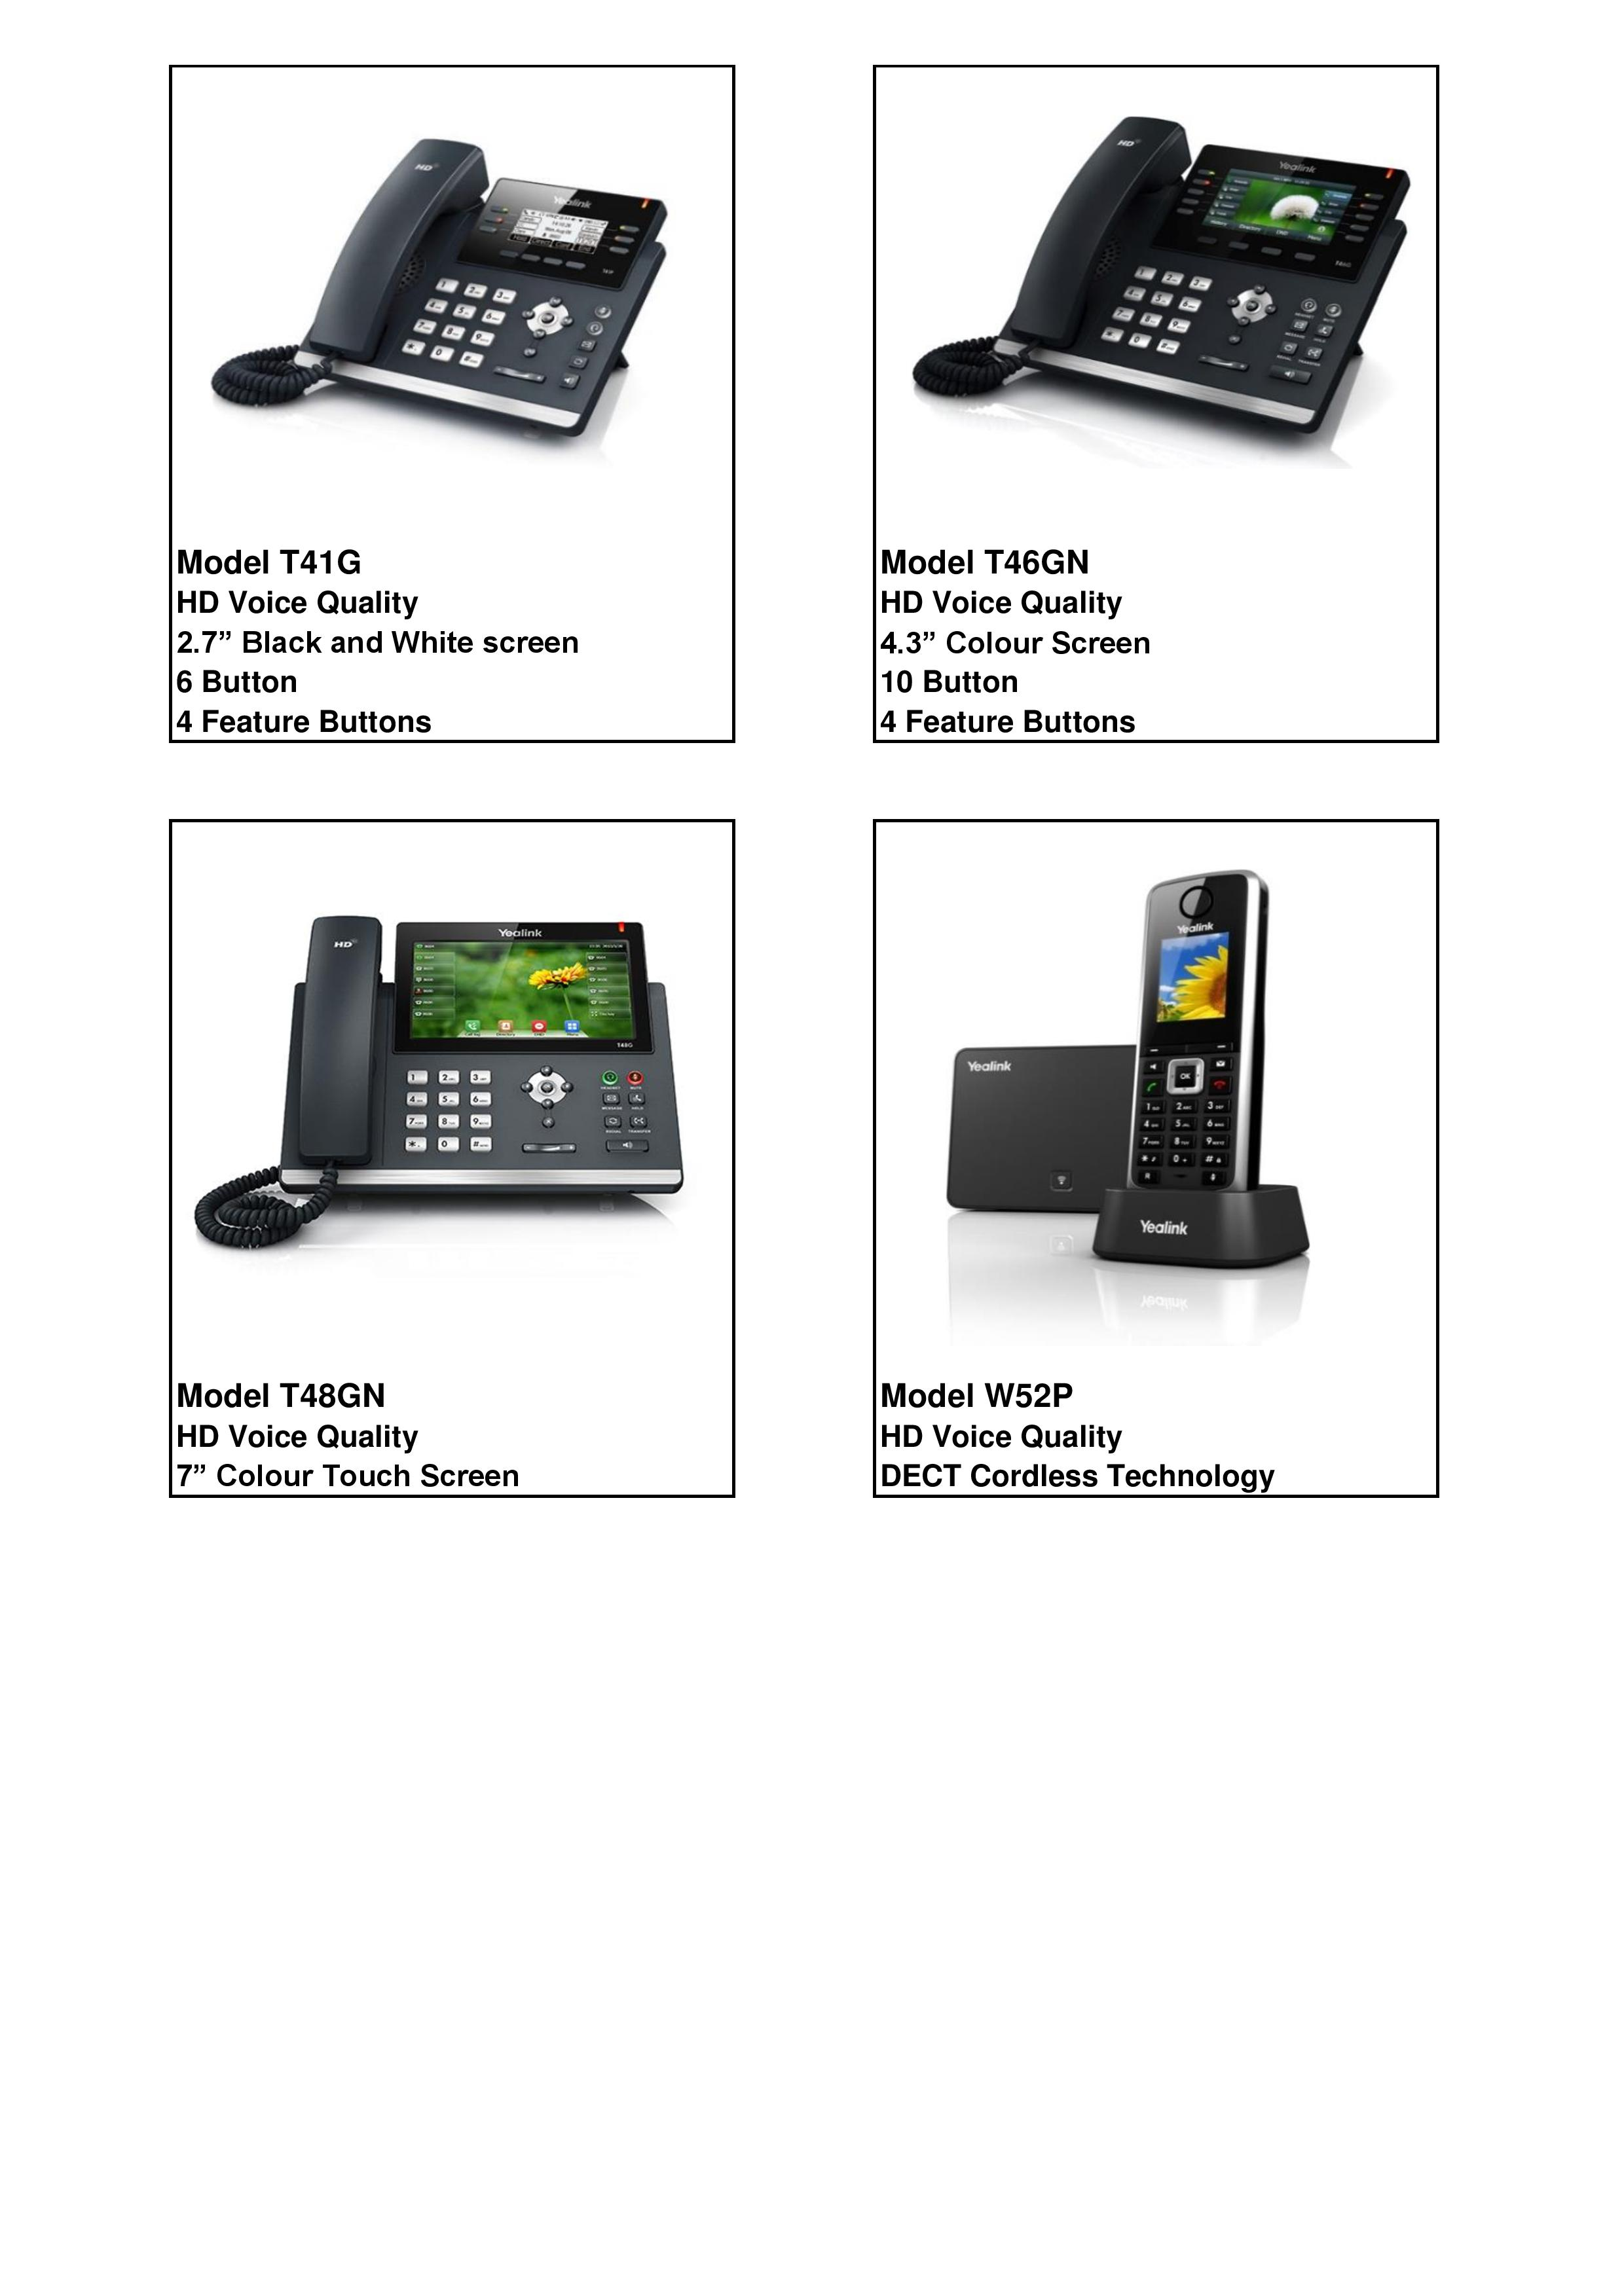 internet-phone-alternative-models-no-price-3